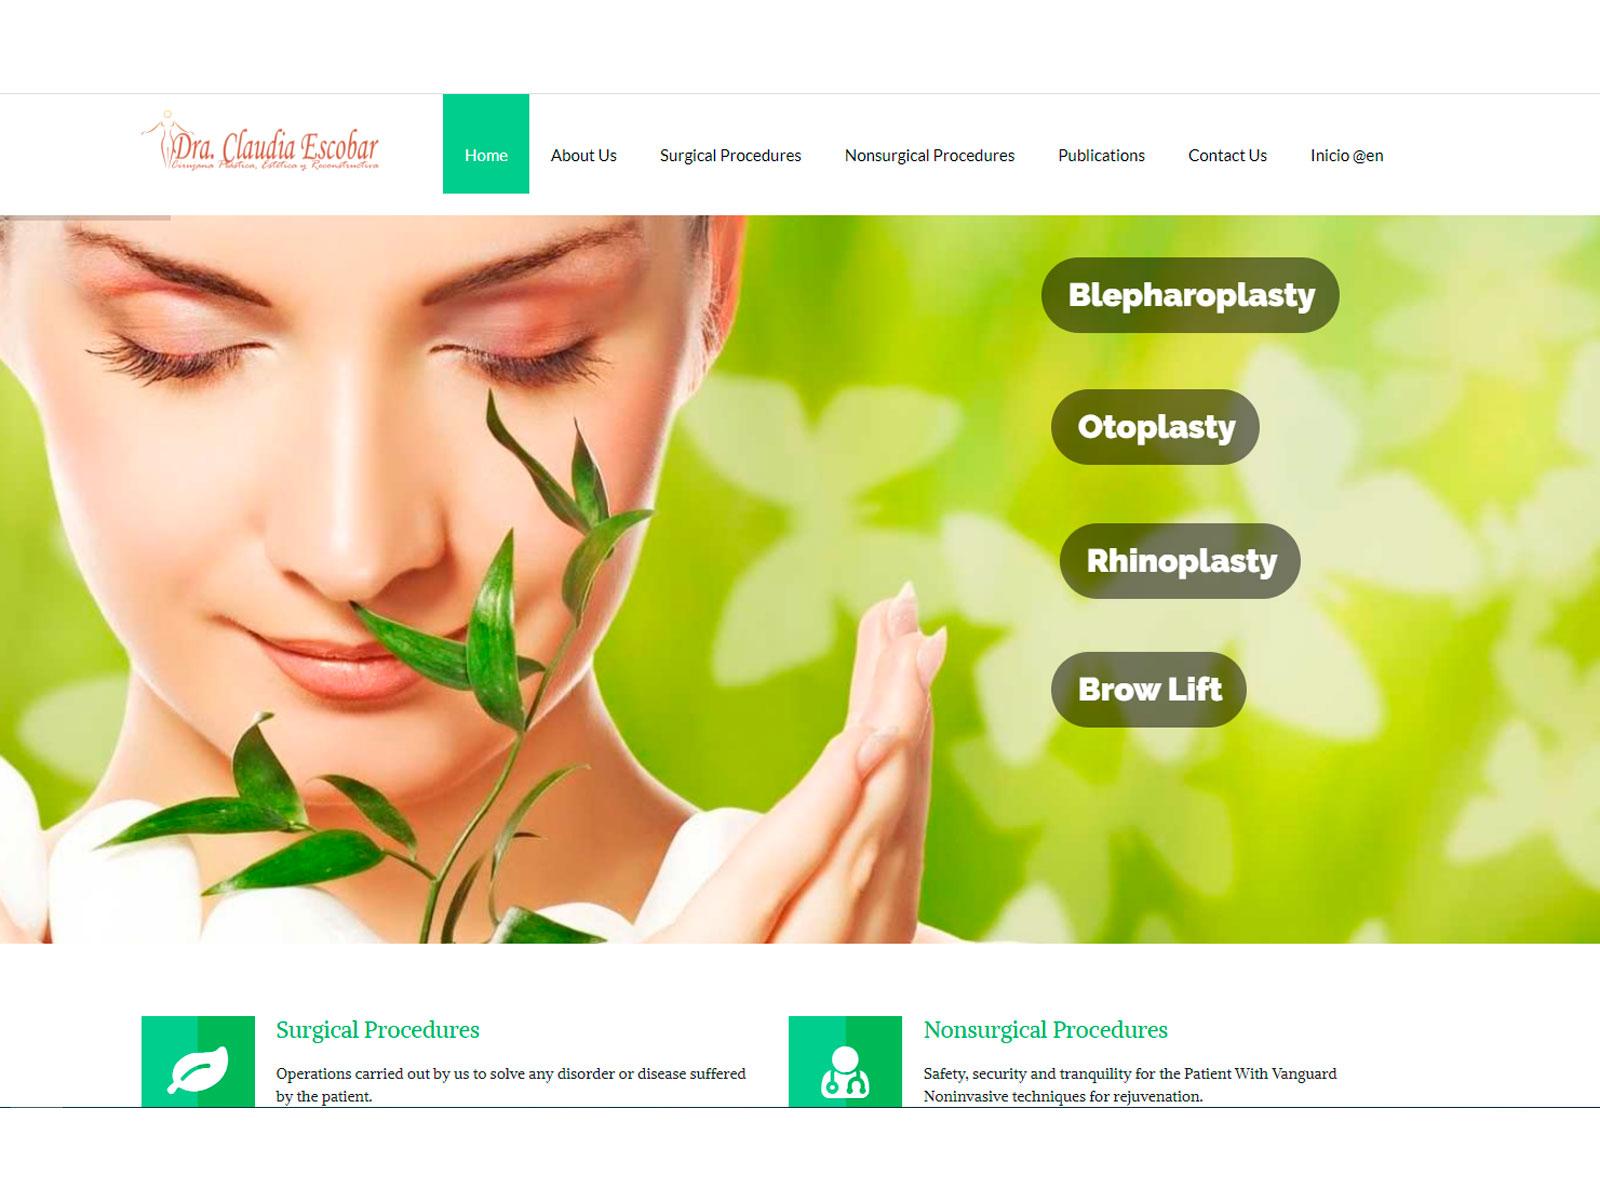 Dra. Claudia Patricia Escobar Website